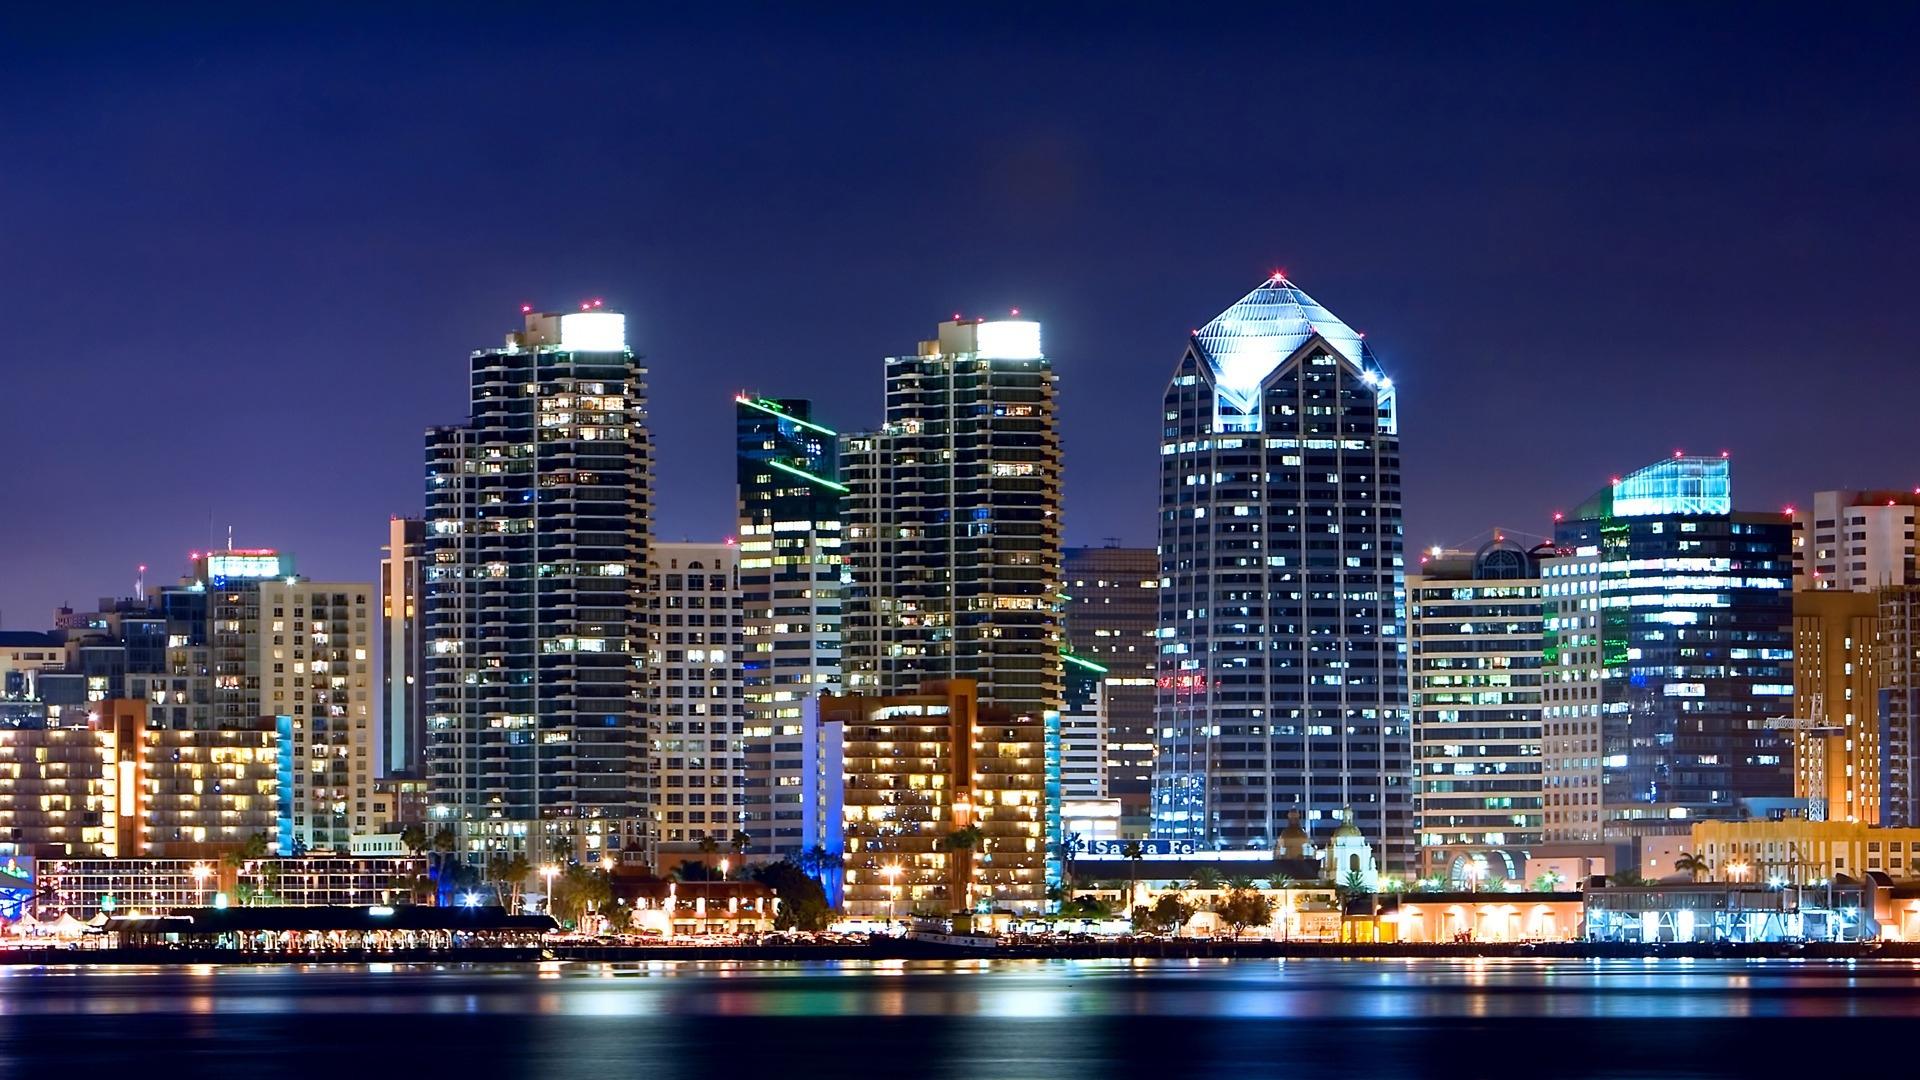 Best Wallpaper Night Aesthetic - San-Diego-night-California-USA-skyscrapers-lights-city-662709  Best Photo Reference.jpg